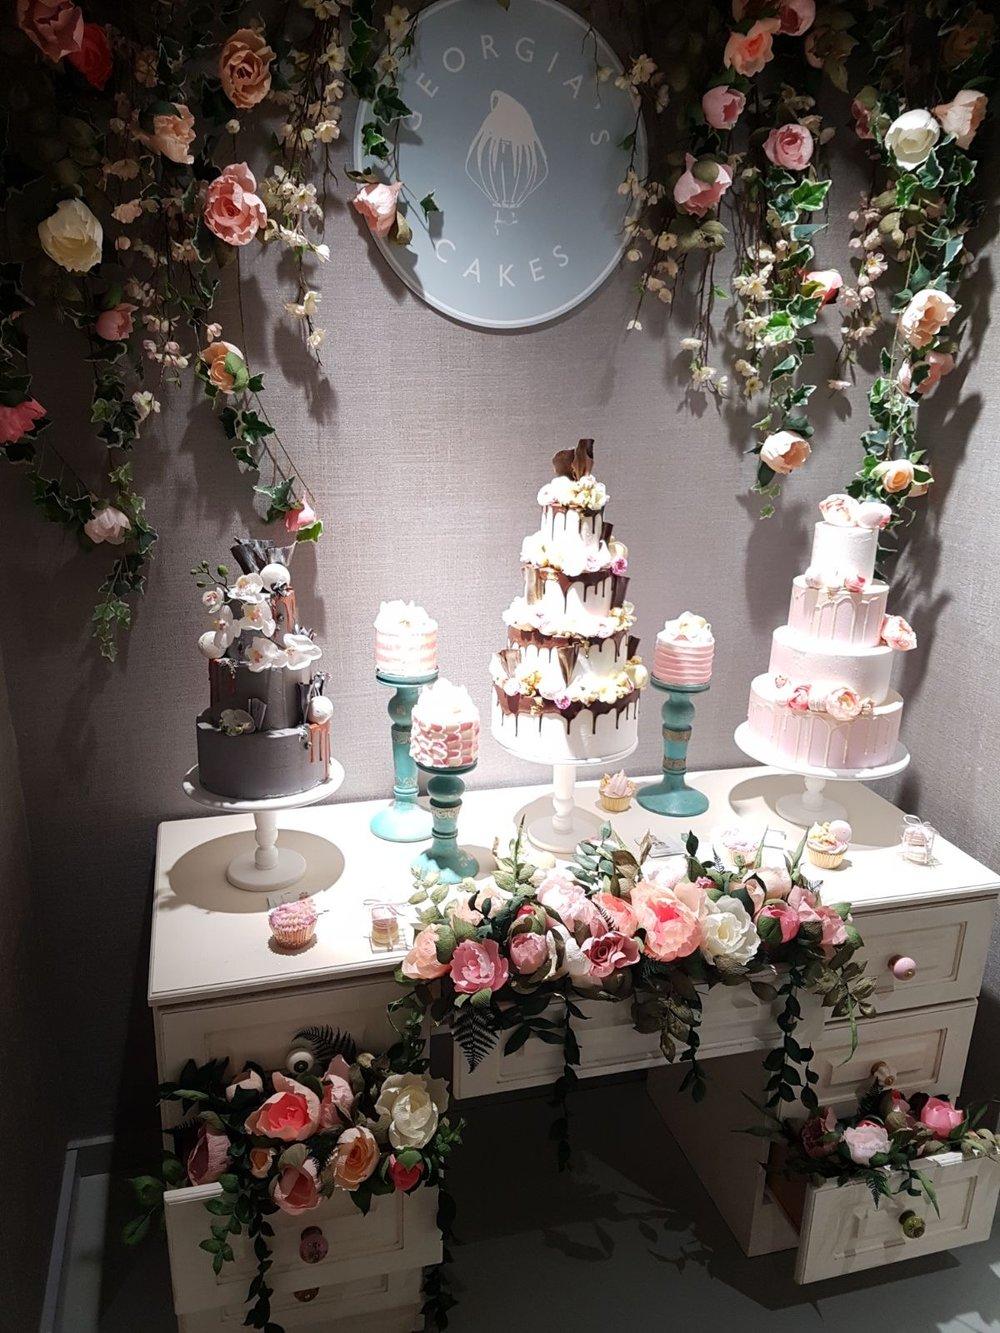 Georgia's Cakes Stand.jpg